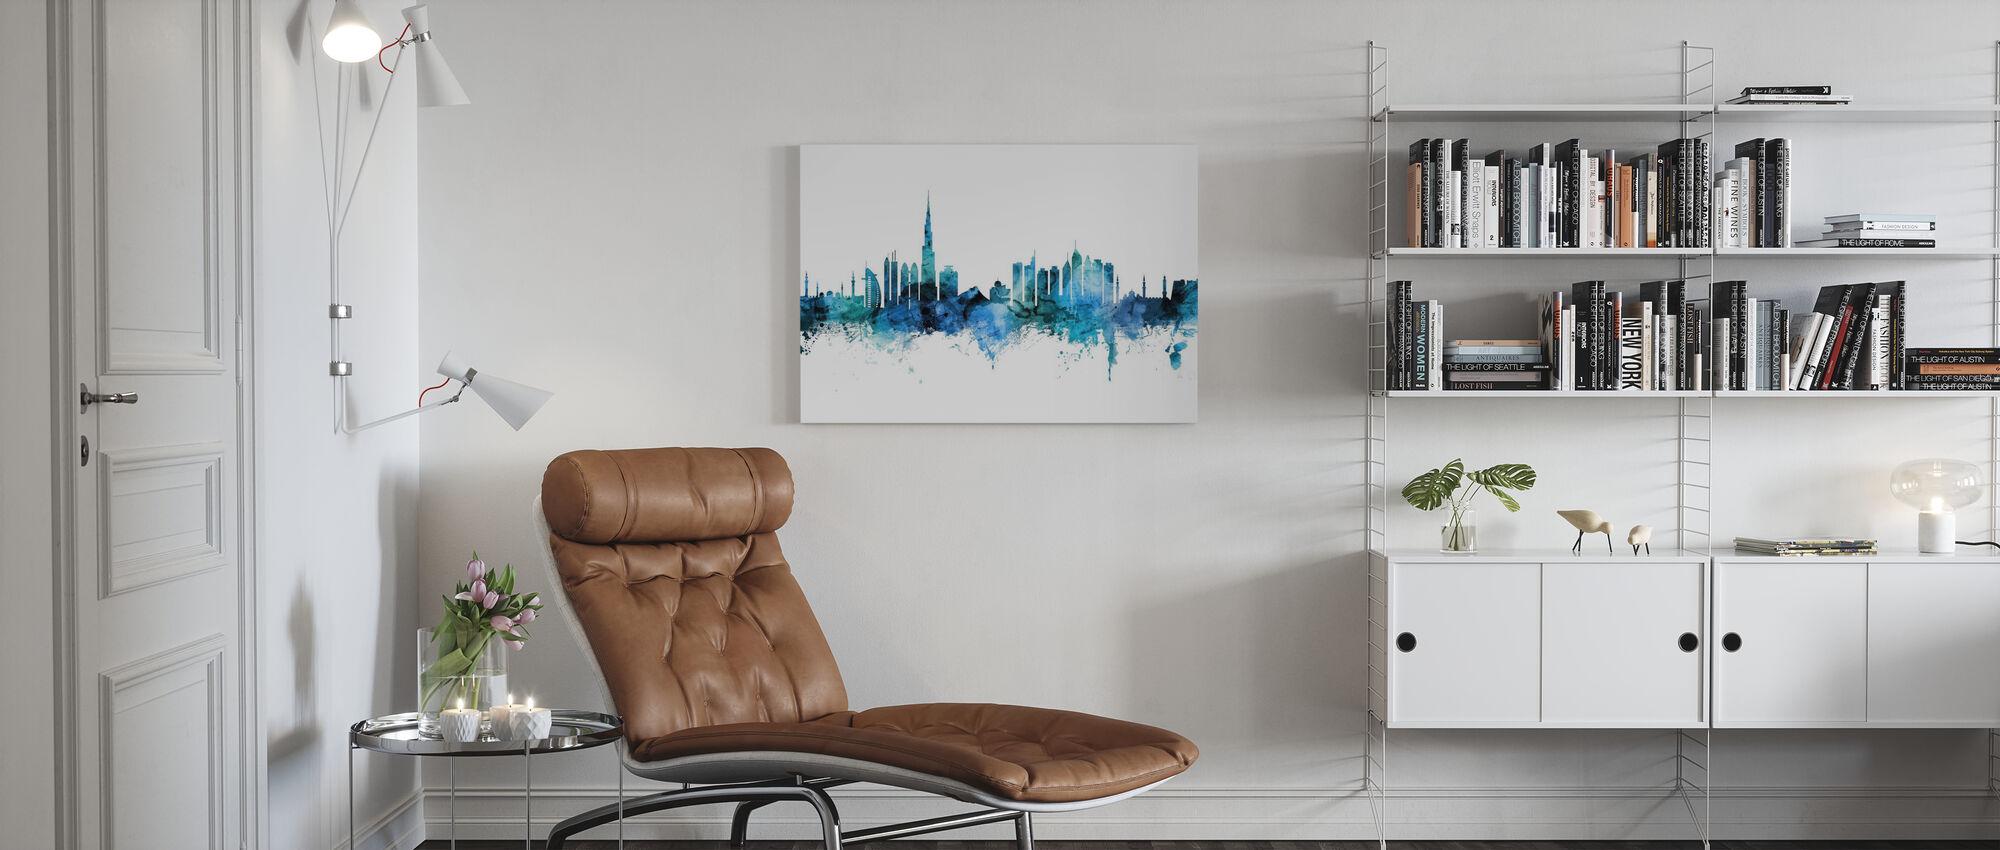 Dubai Skyline - Leinwandbild - Wohnzimmer